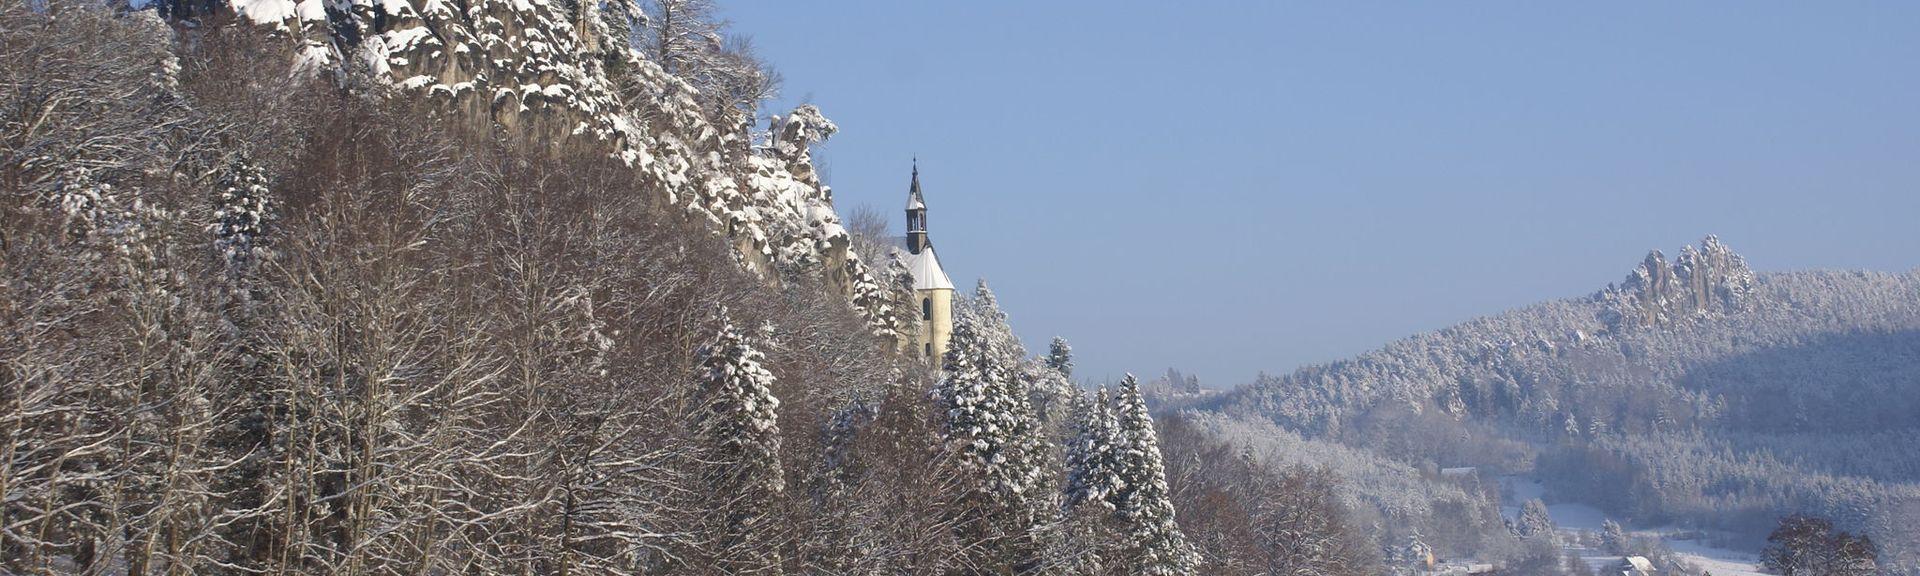 Turnov, Kraj liberecki, Czechy